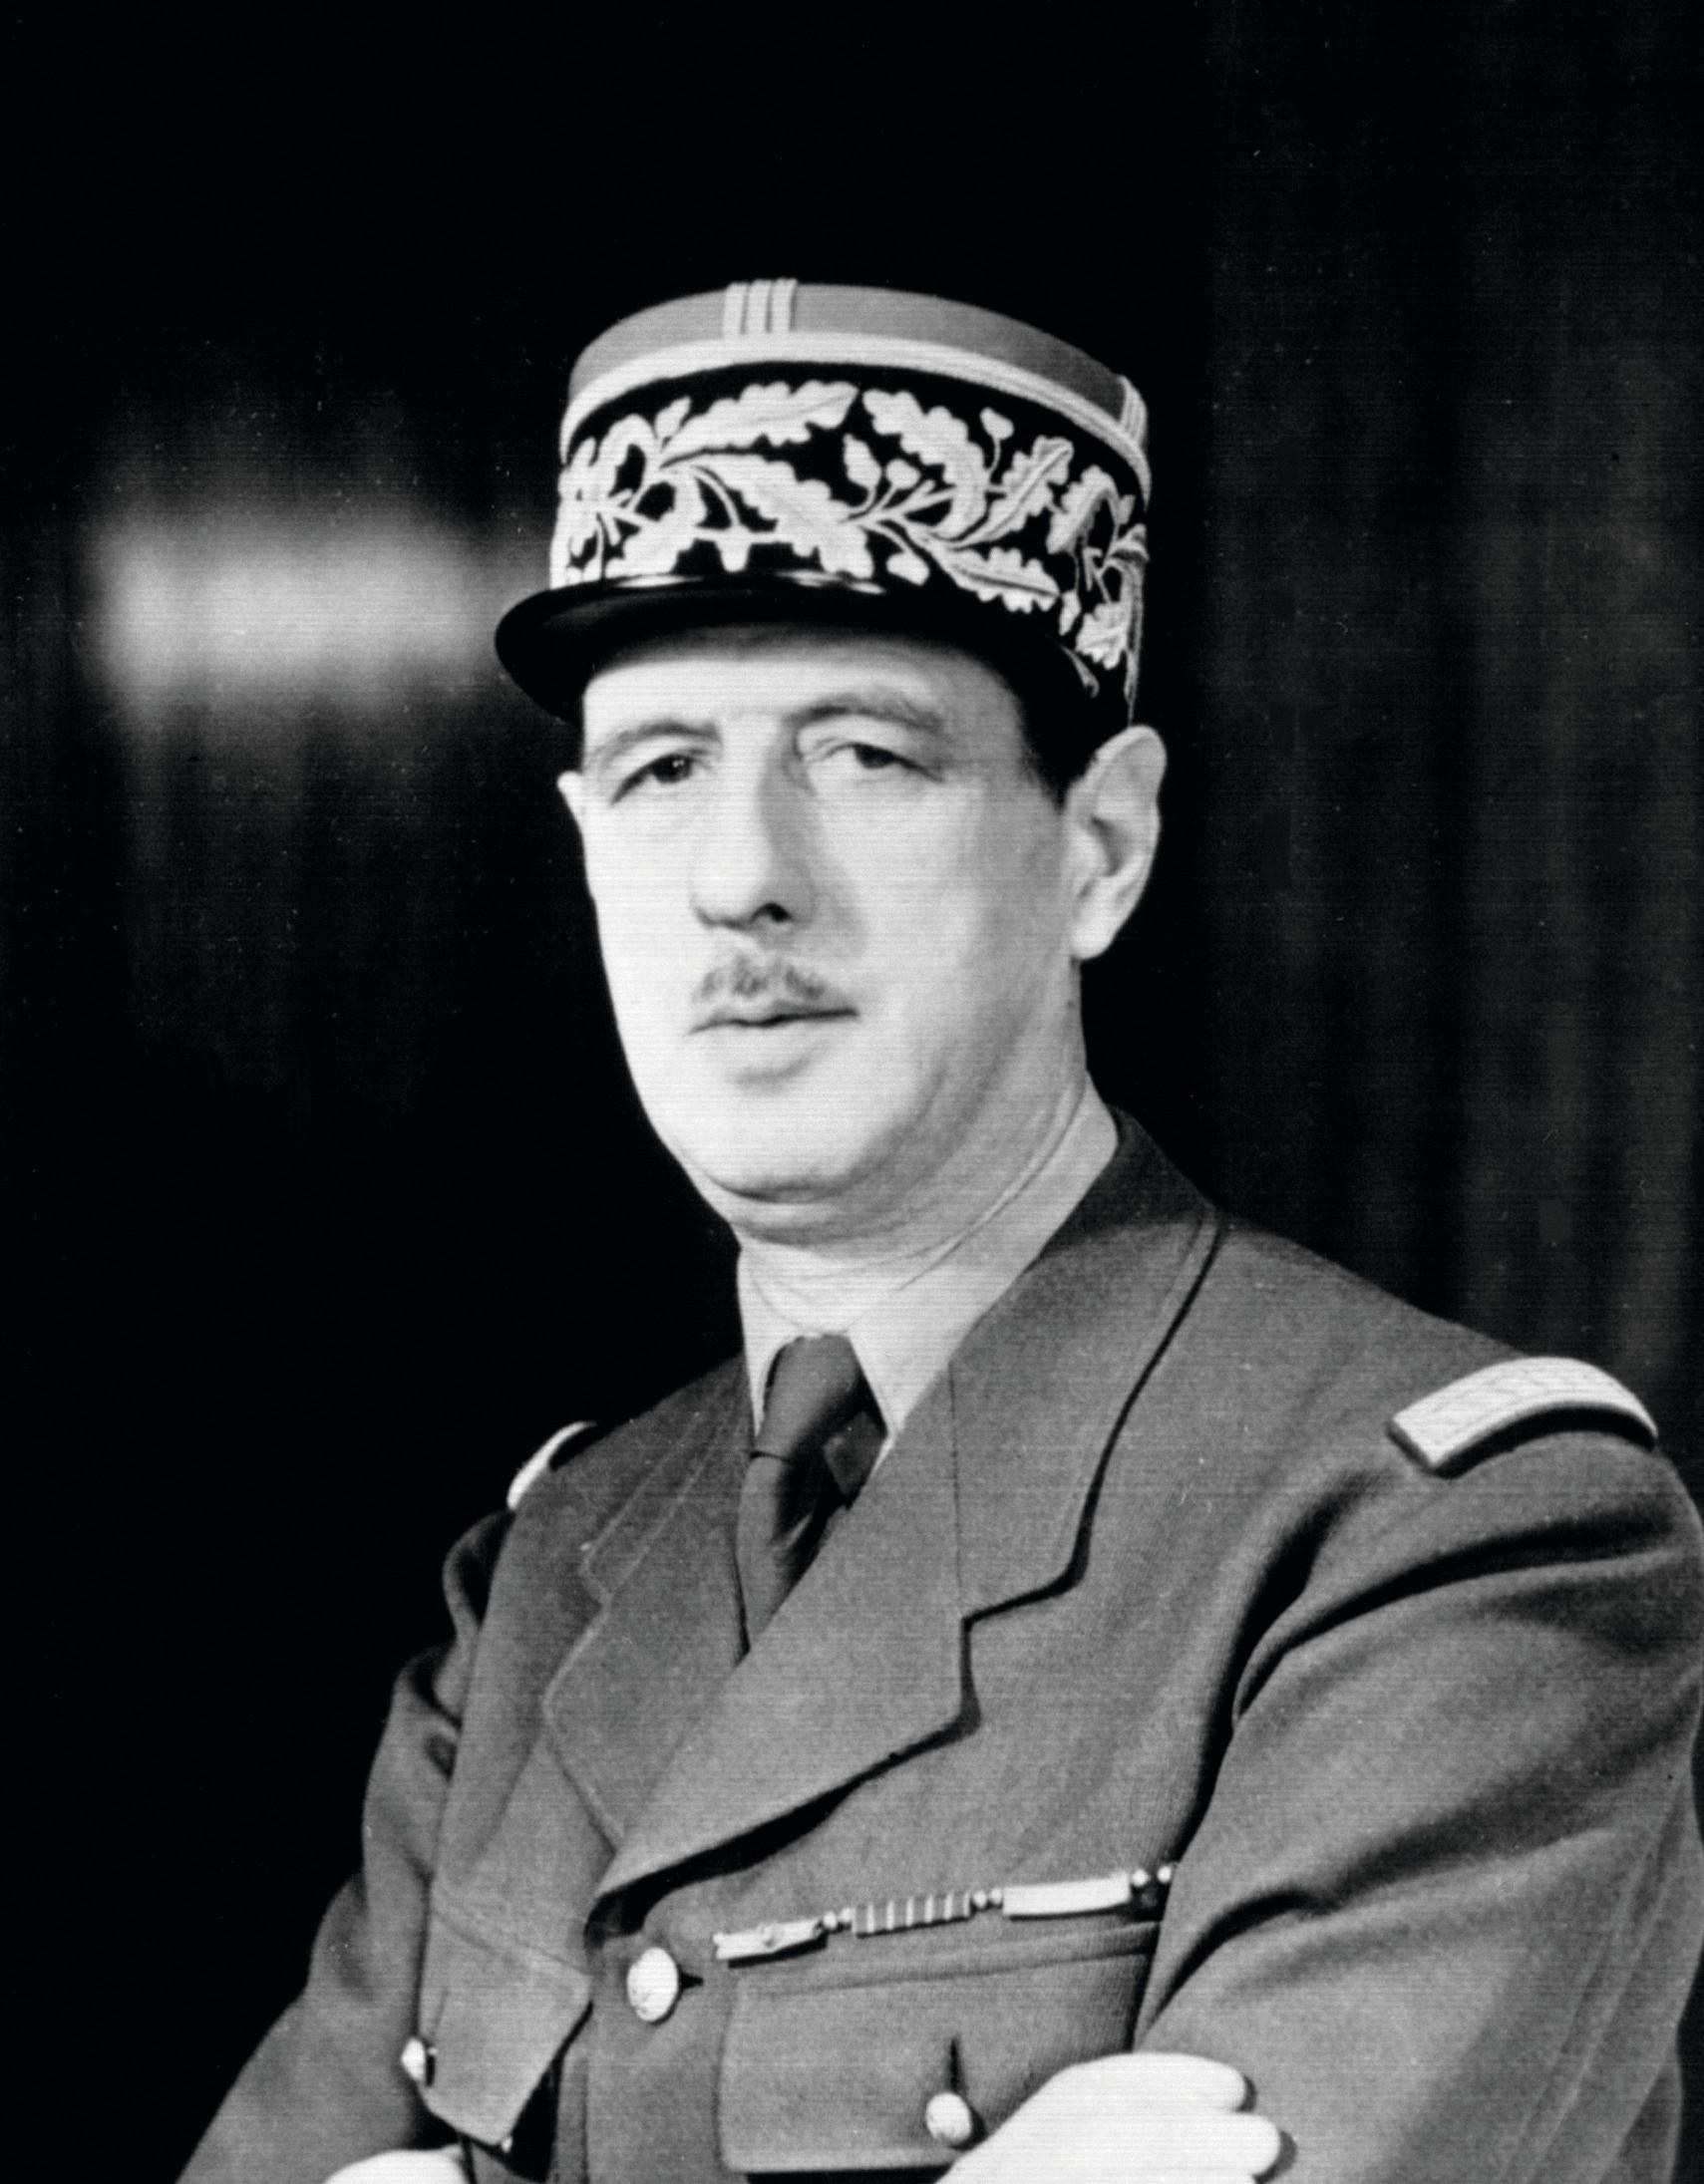 Charles de Gaulle (1890-1970)